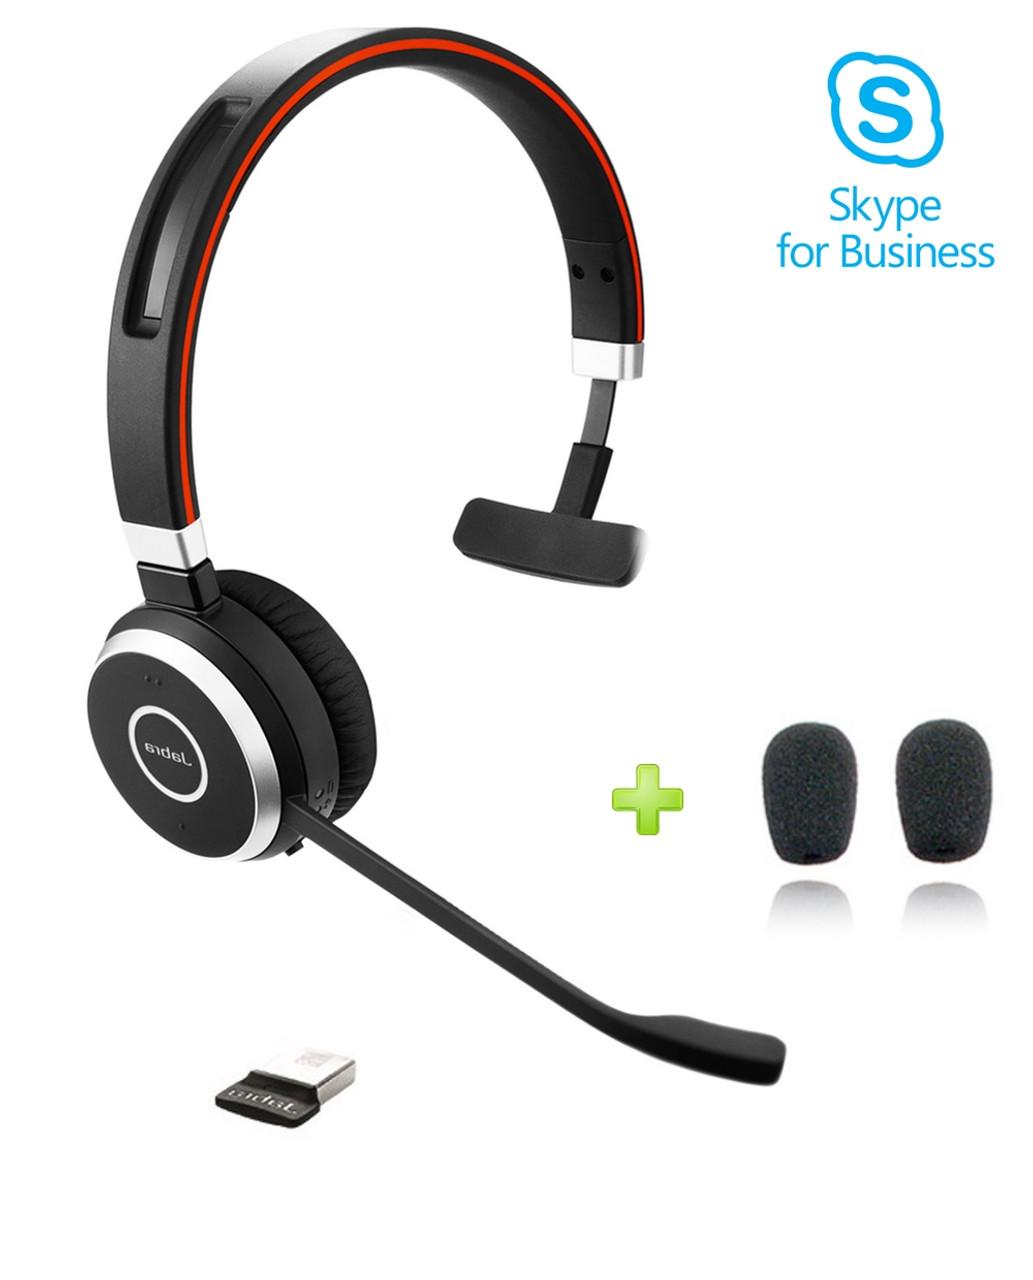 Jabra Evolve 65 Ms Mono Bluetooth Headset Usb Bundle Windows Pc Mac Smartphone Streaming Music Skype Ip Communications 6593 823 309